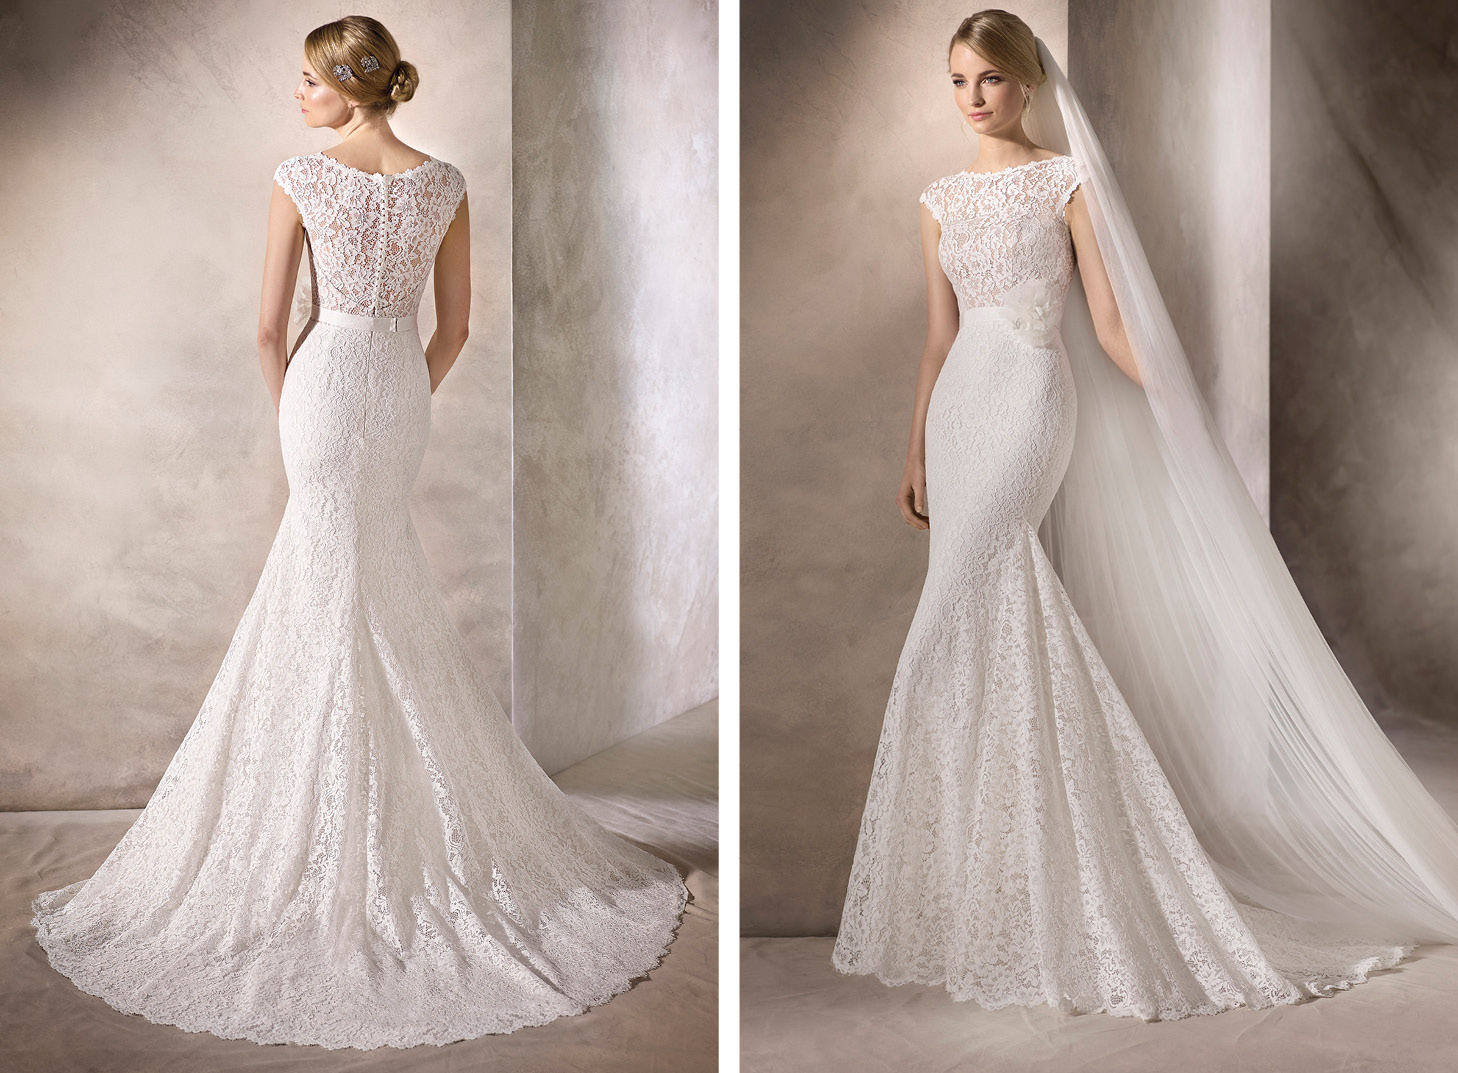 la sposa wedding dresses photo - 1